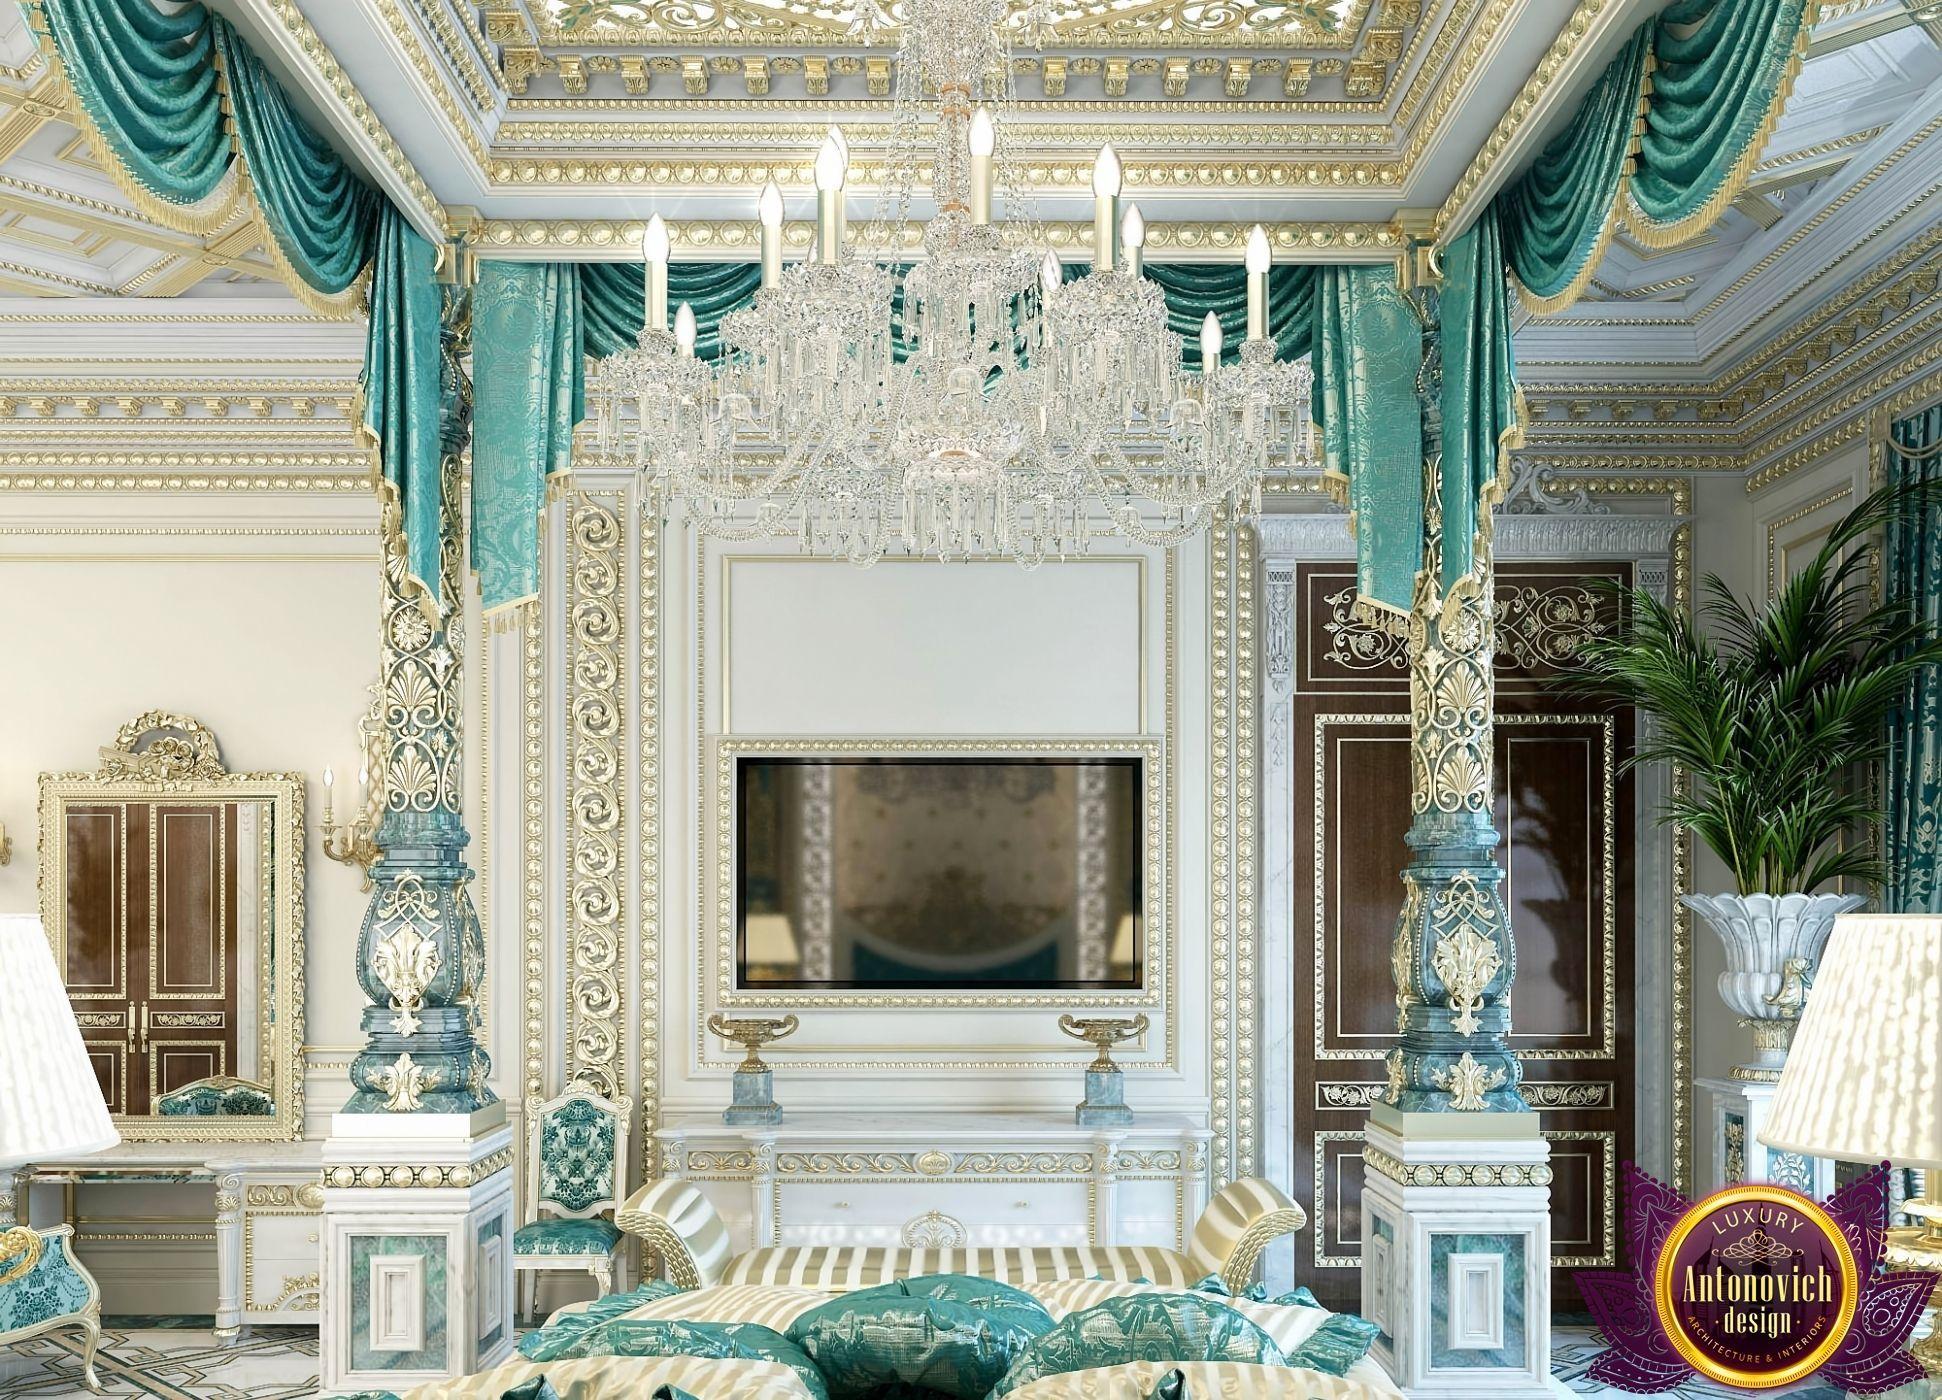 Bedroom Design In Dubai Luxury Royal Master Bedroom Design Photo 2 Master Bedroom Design Bedroom Interior Bedroom Design